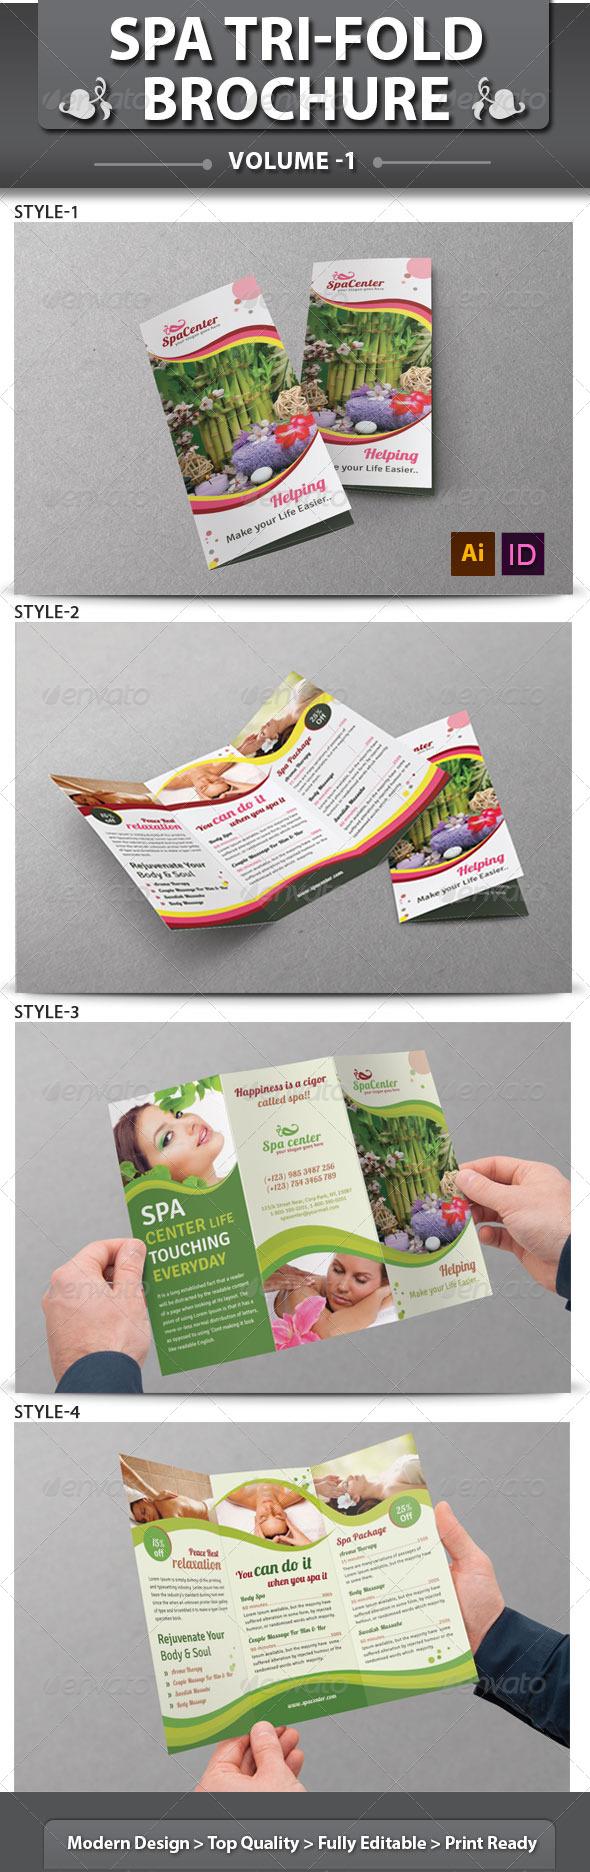 Spa & Beauty Saloon Tri-fold Brochure | Volume 14 - Corporate Brochures